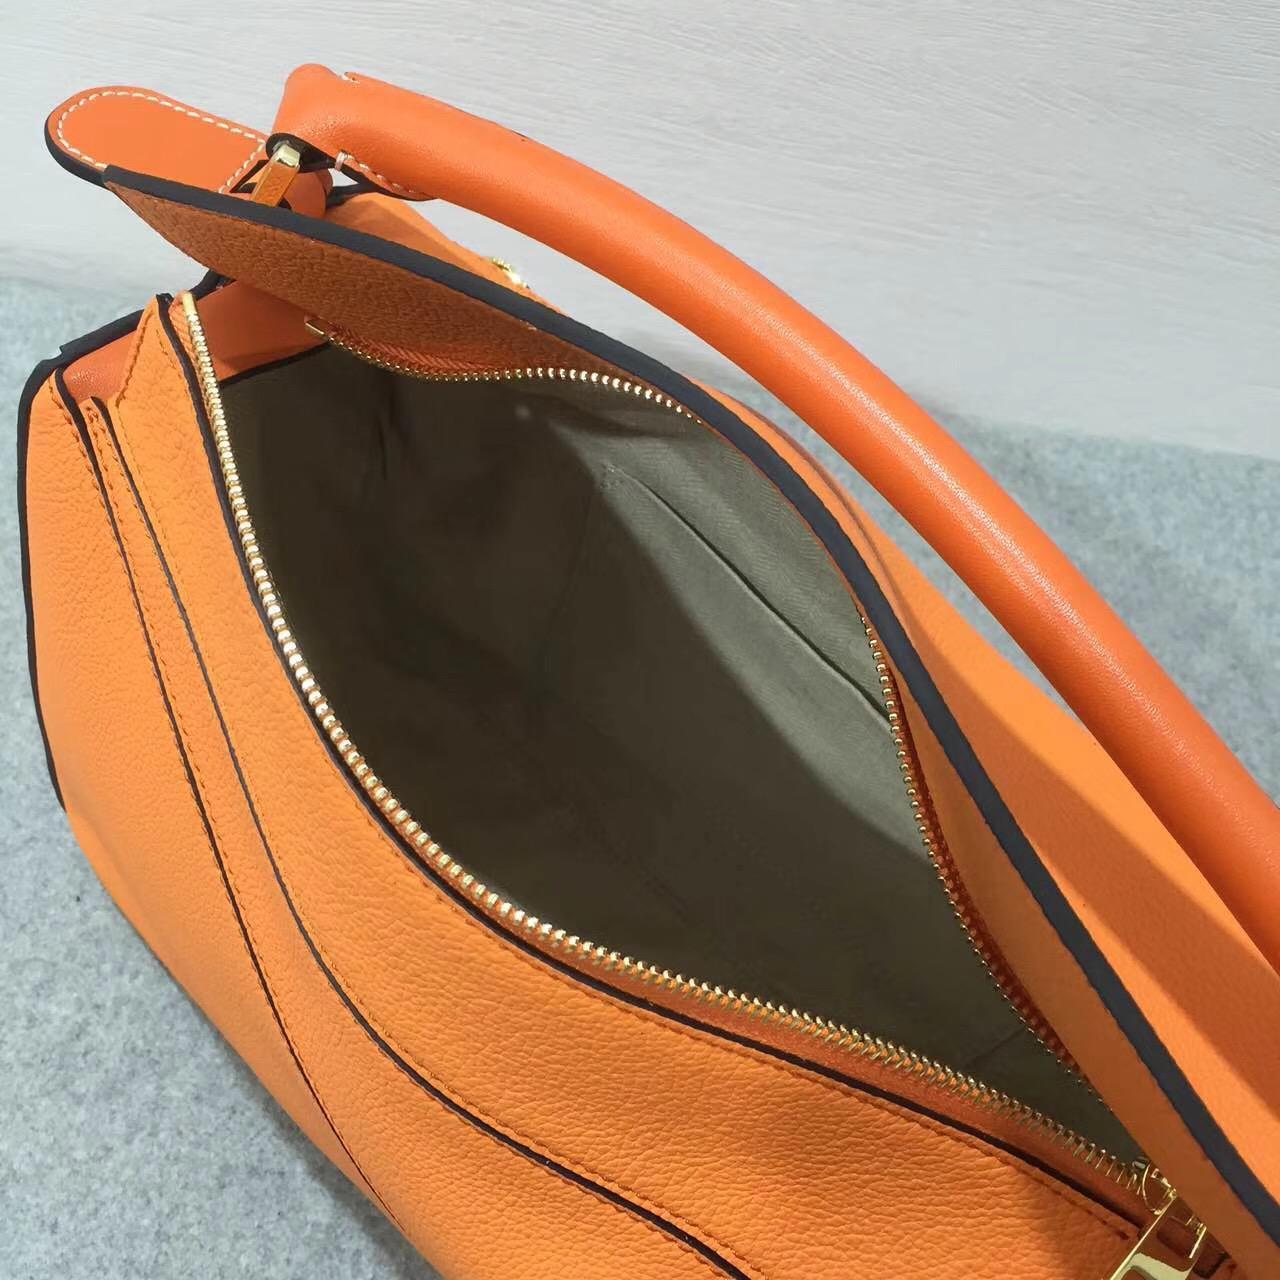 Loewe羅意威中號幾何包 Puzzle Bag 顆粒小牛皮 Apricot/Orange